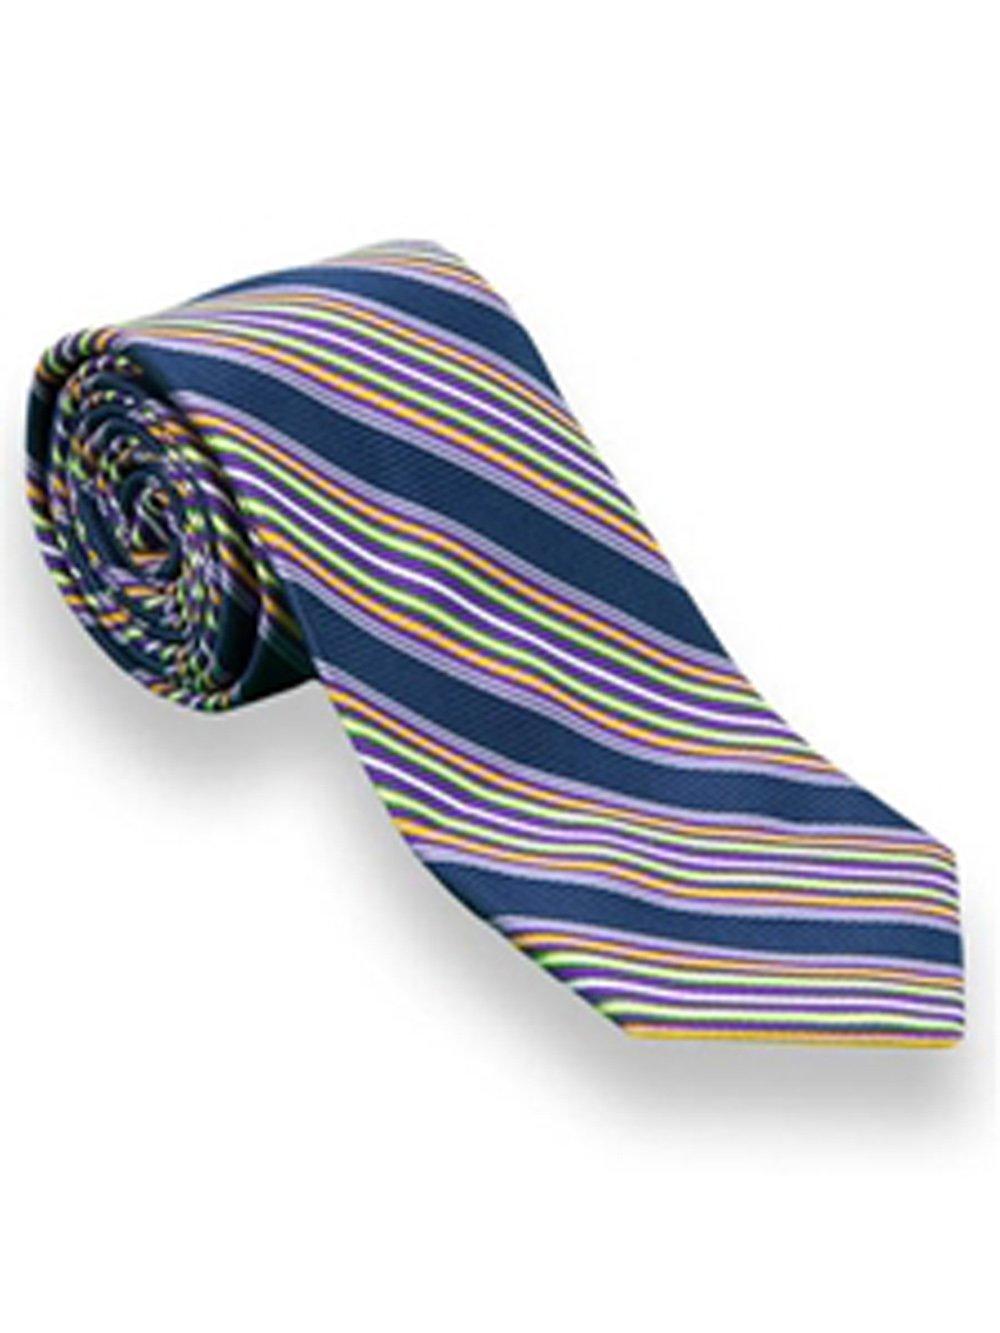 Robert Talbott Purple Striped American Traditional Best Of Class Tie